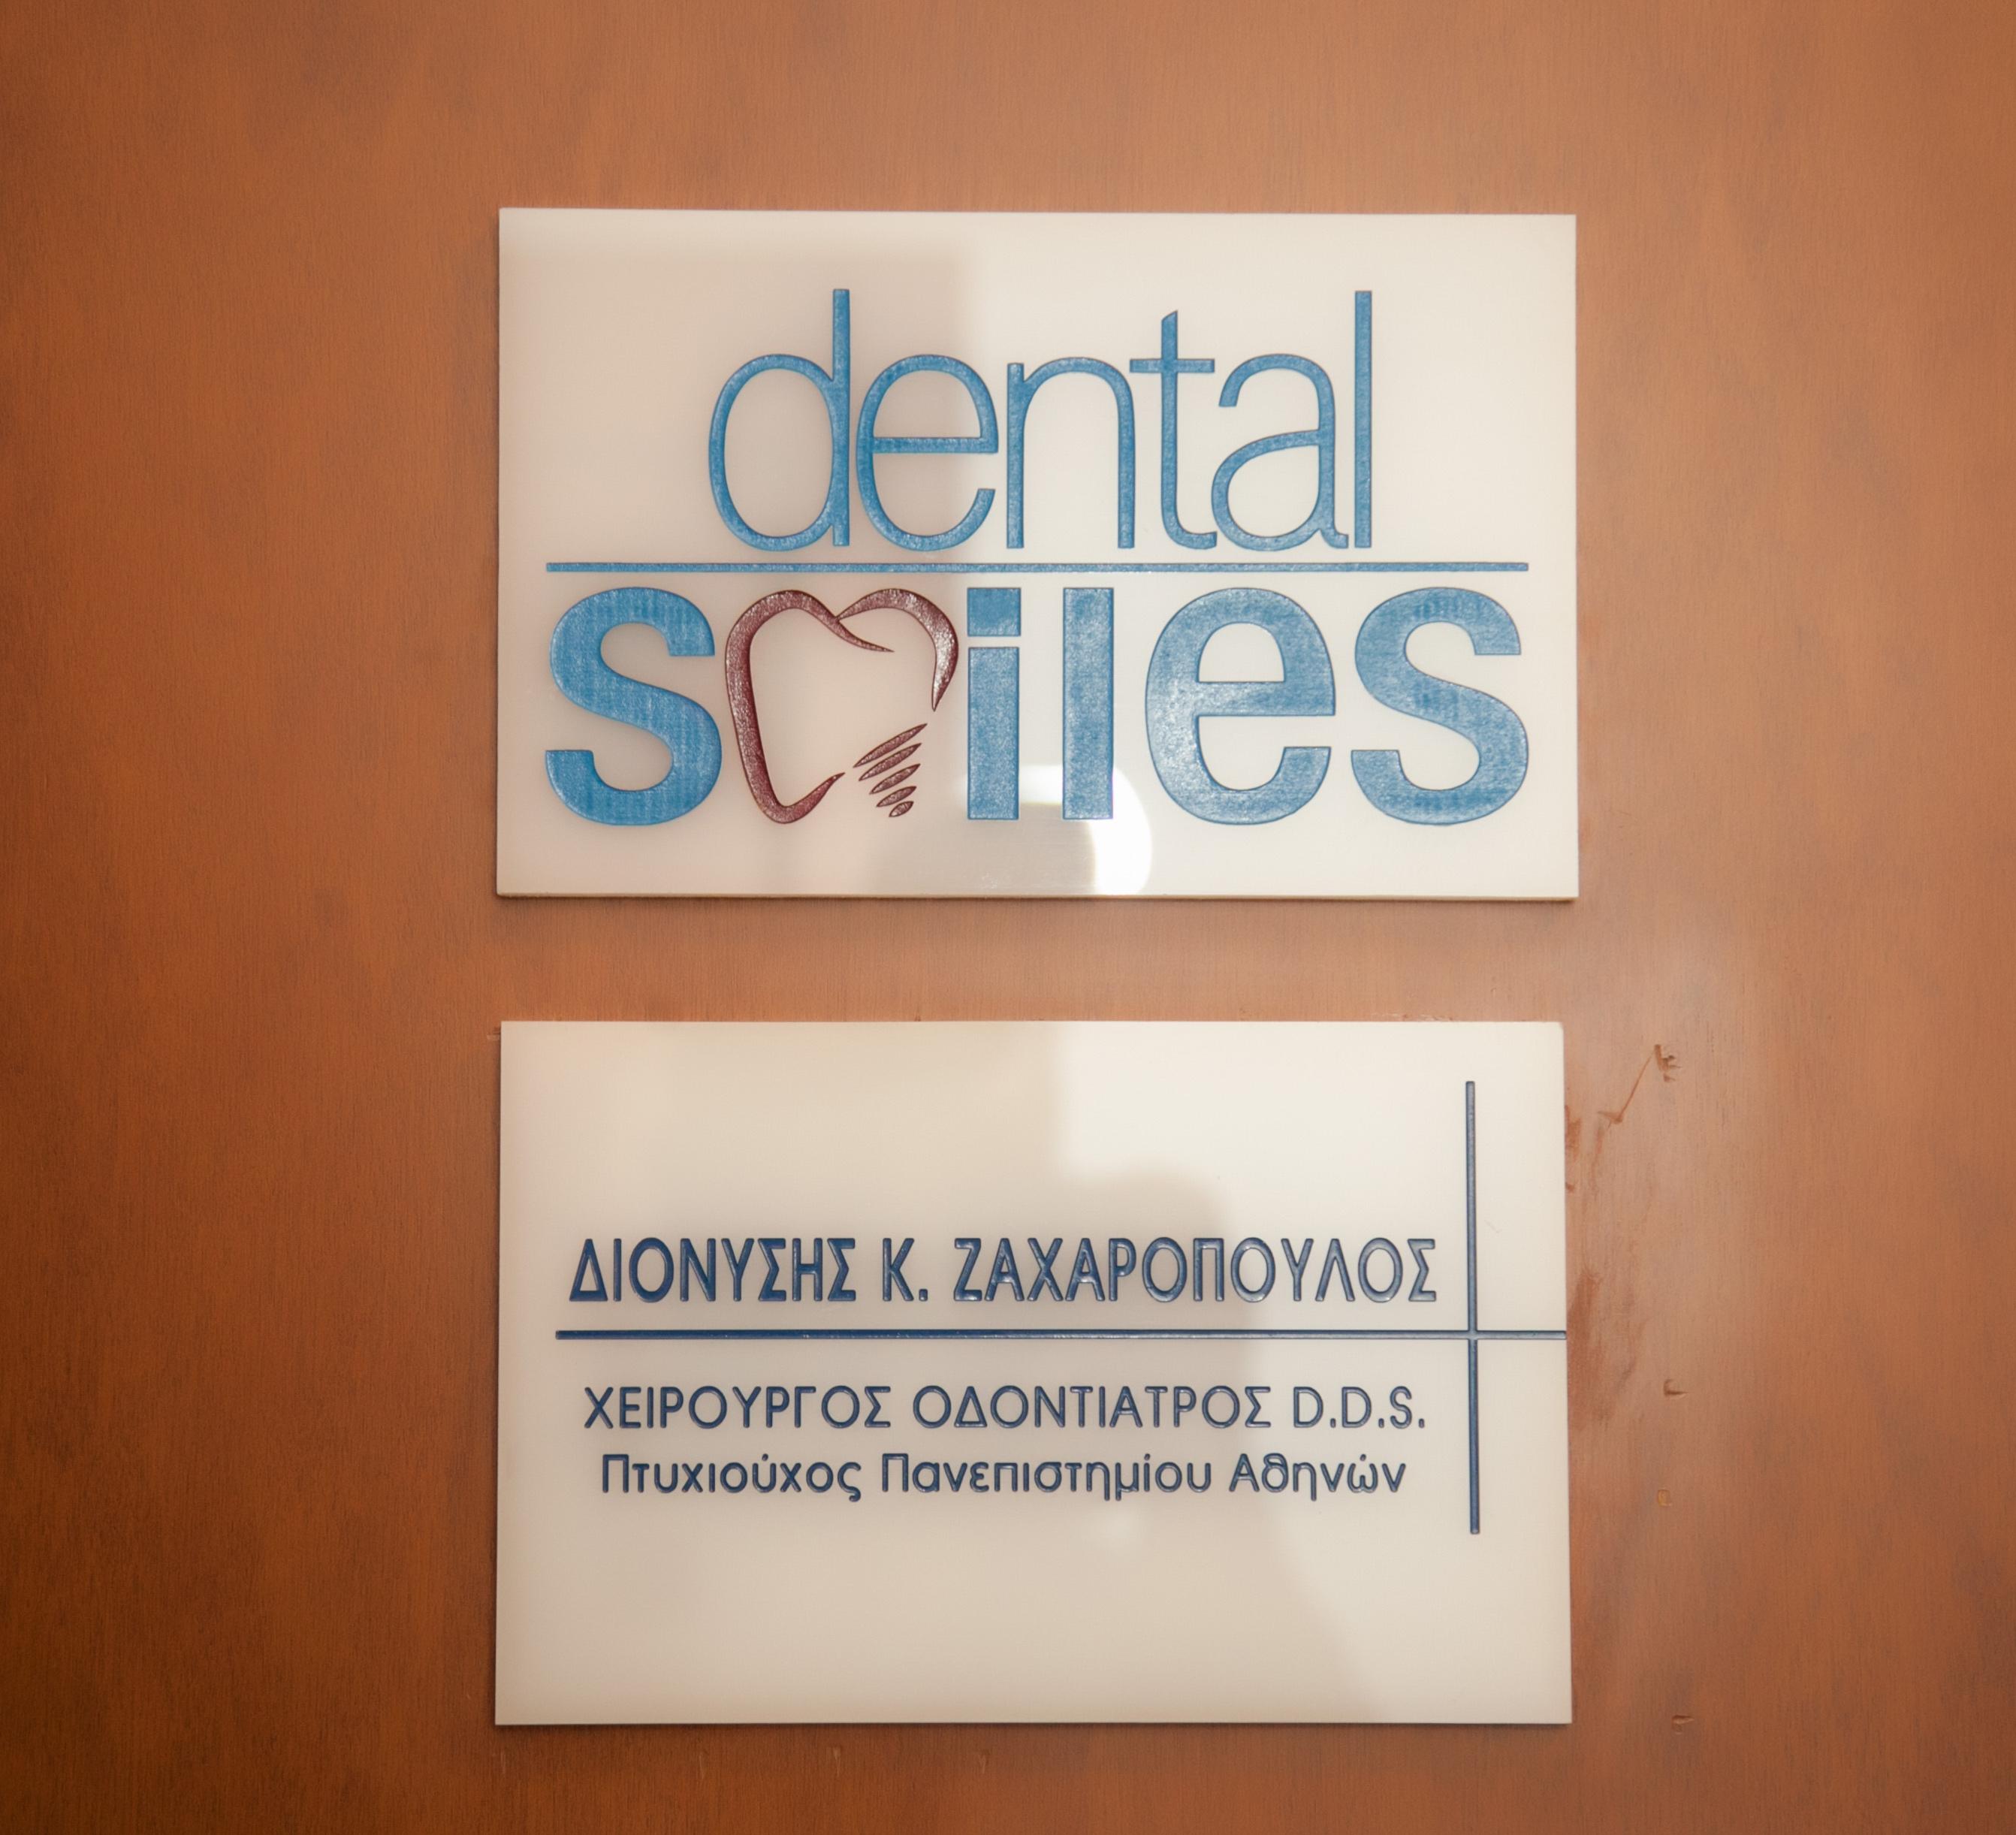 Dental clinic DentalSmiles | Οδοντιατρική Κλινική - Αθήνα